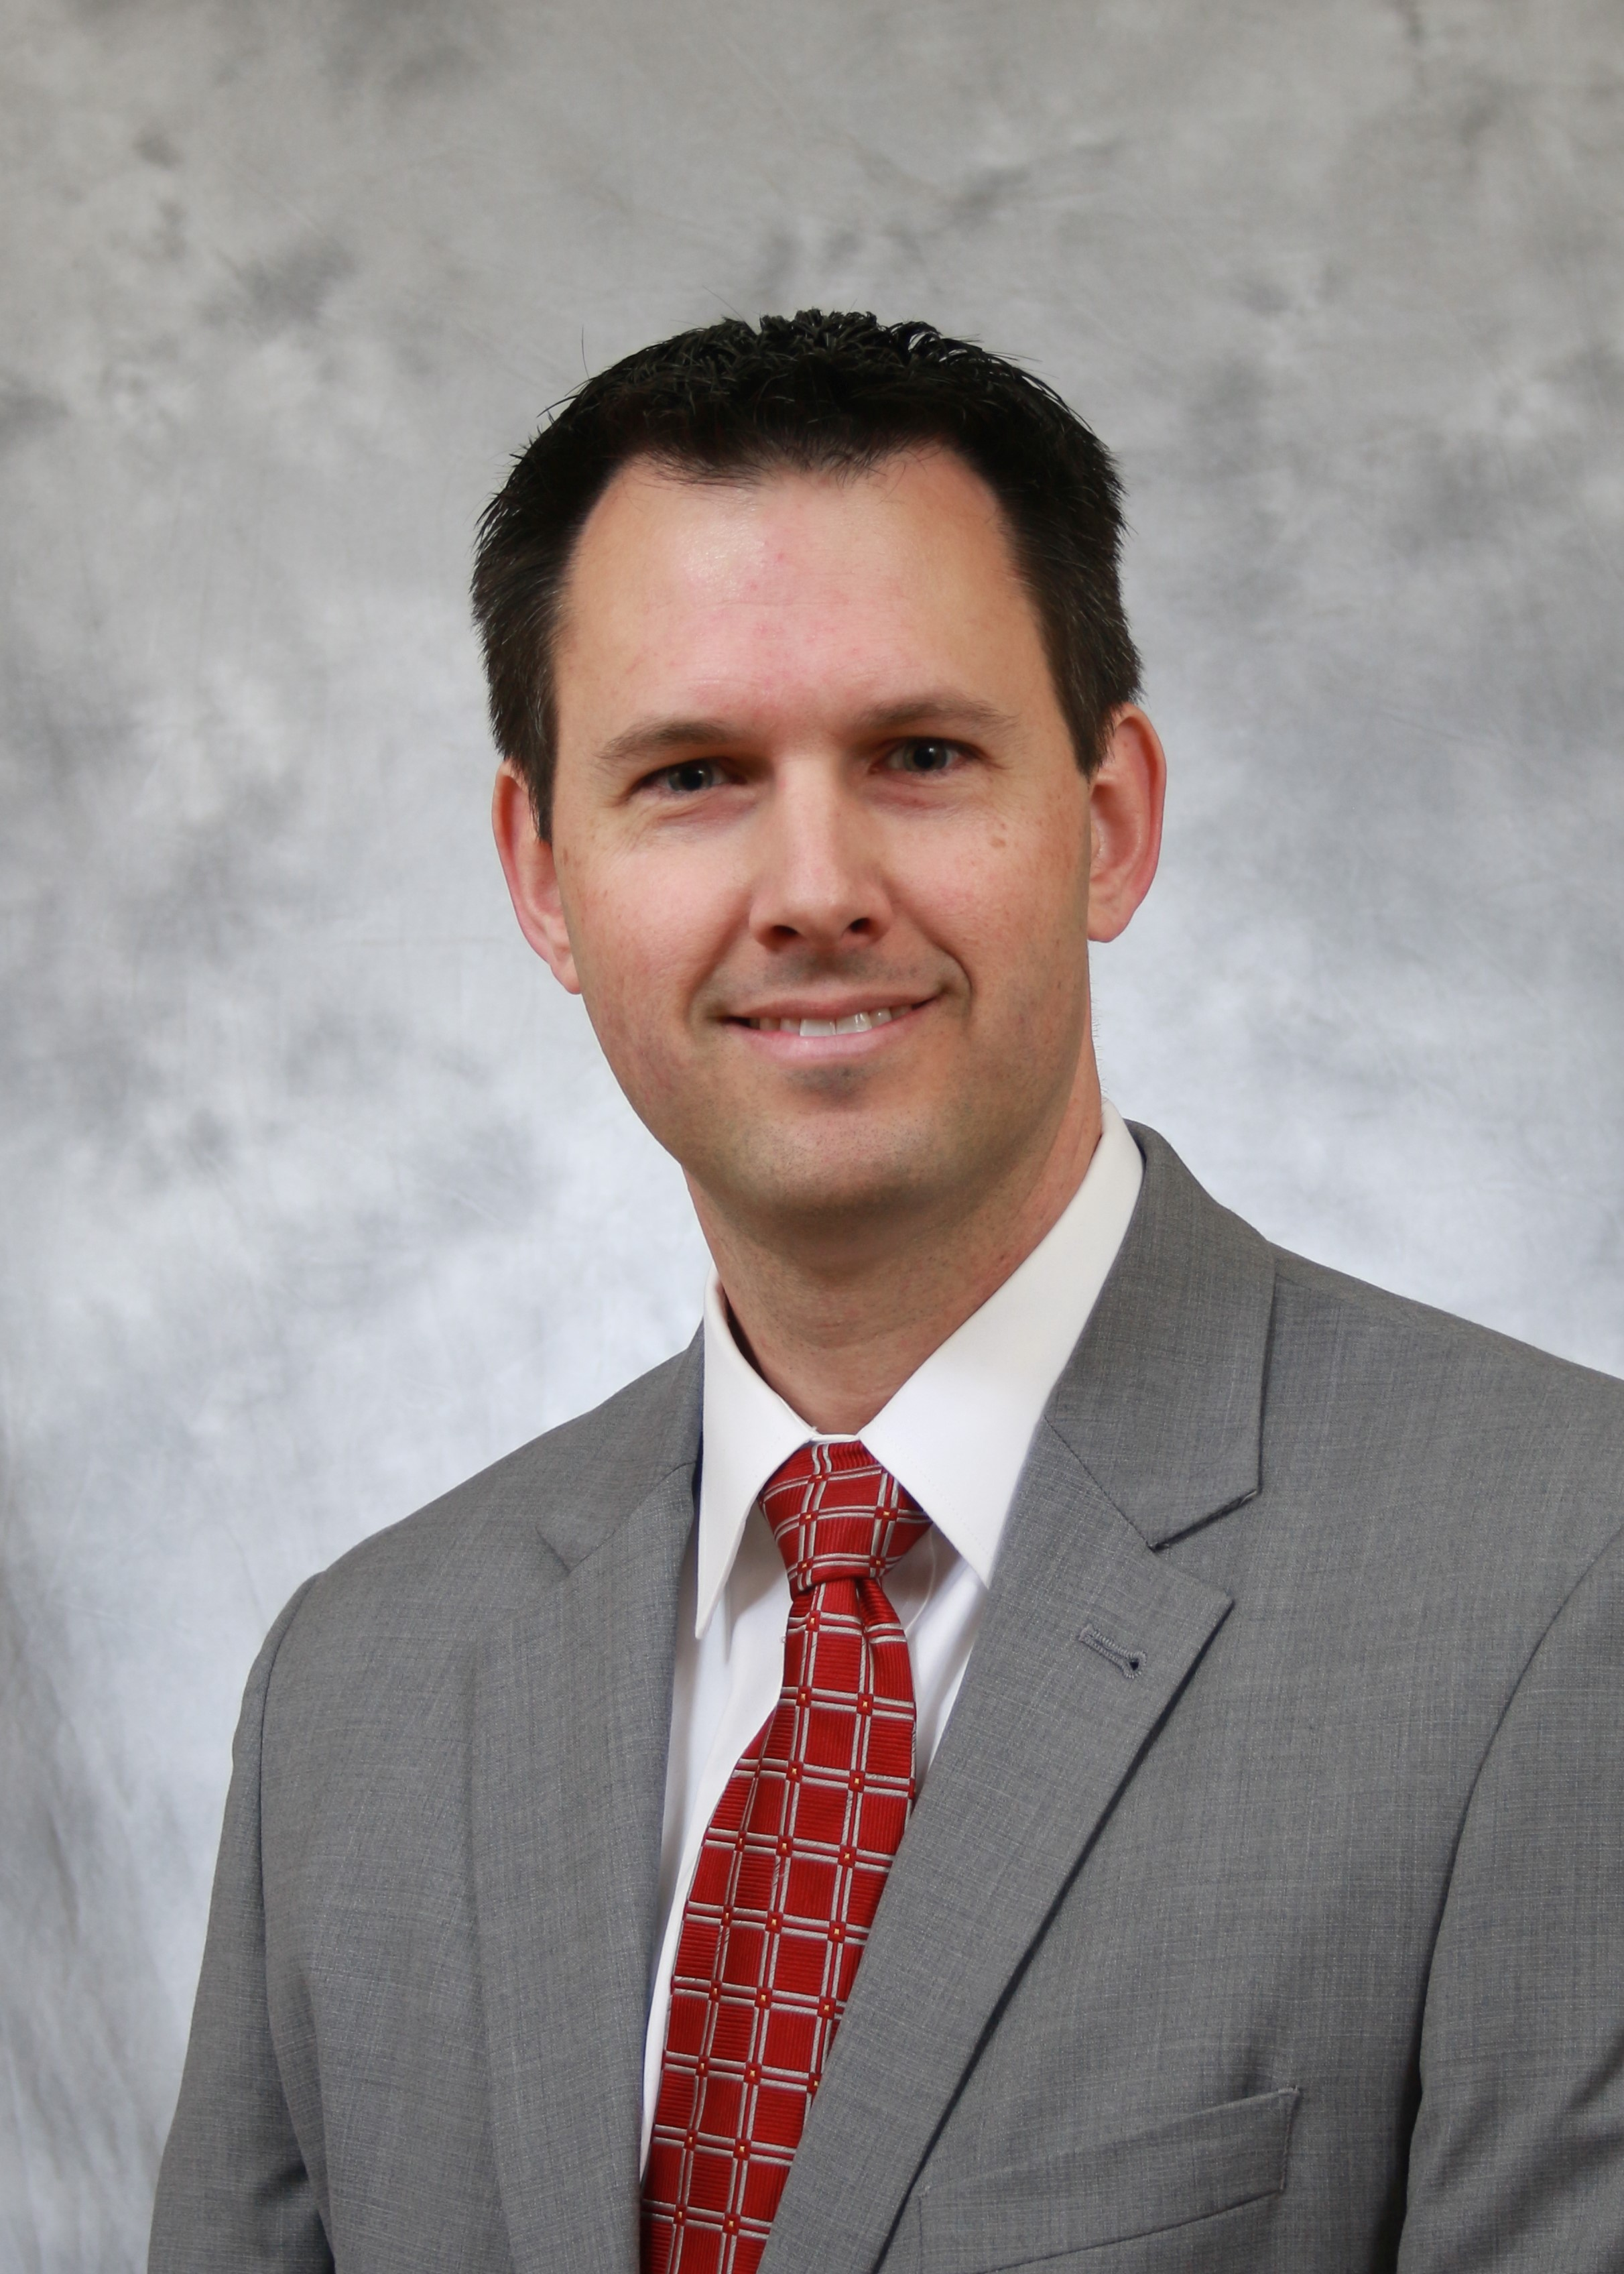 Bradley Raetzke, MD, MBA, FACEP